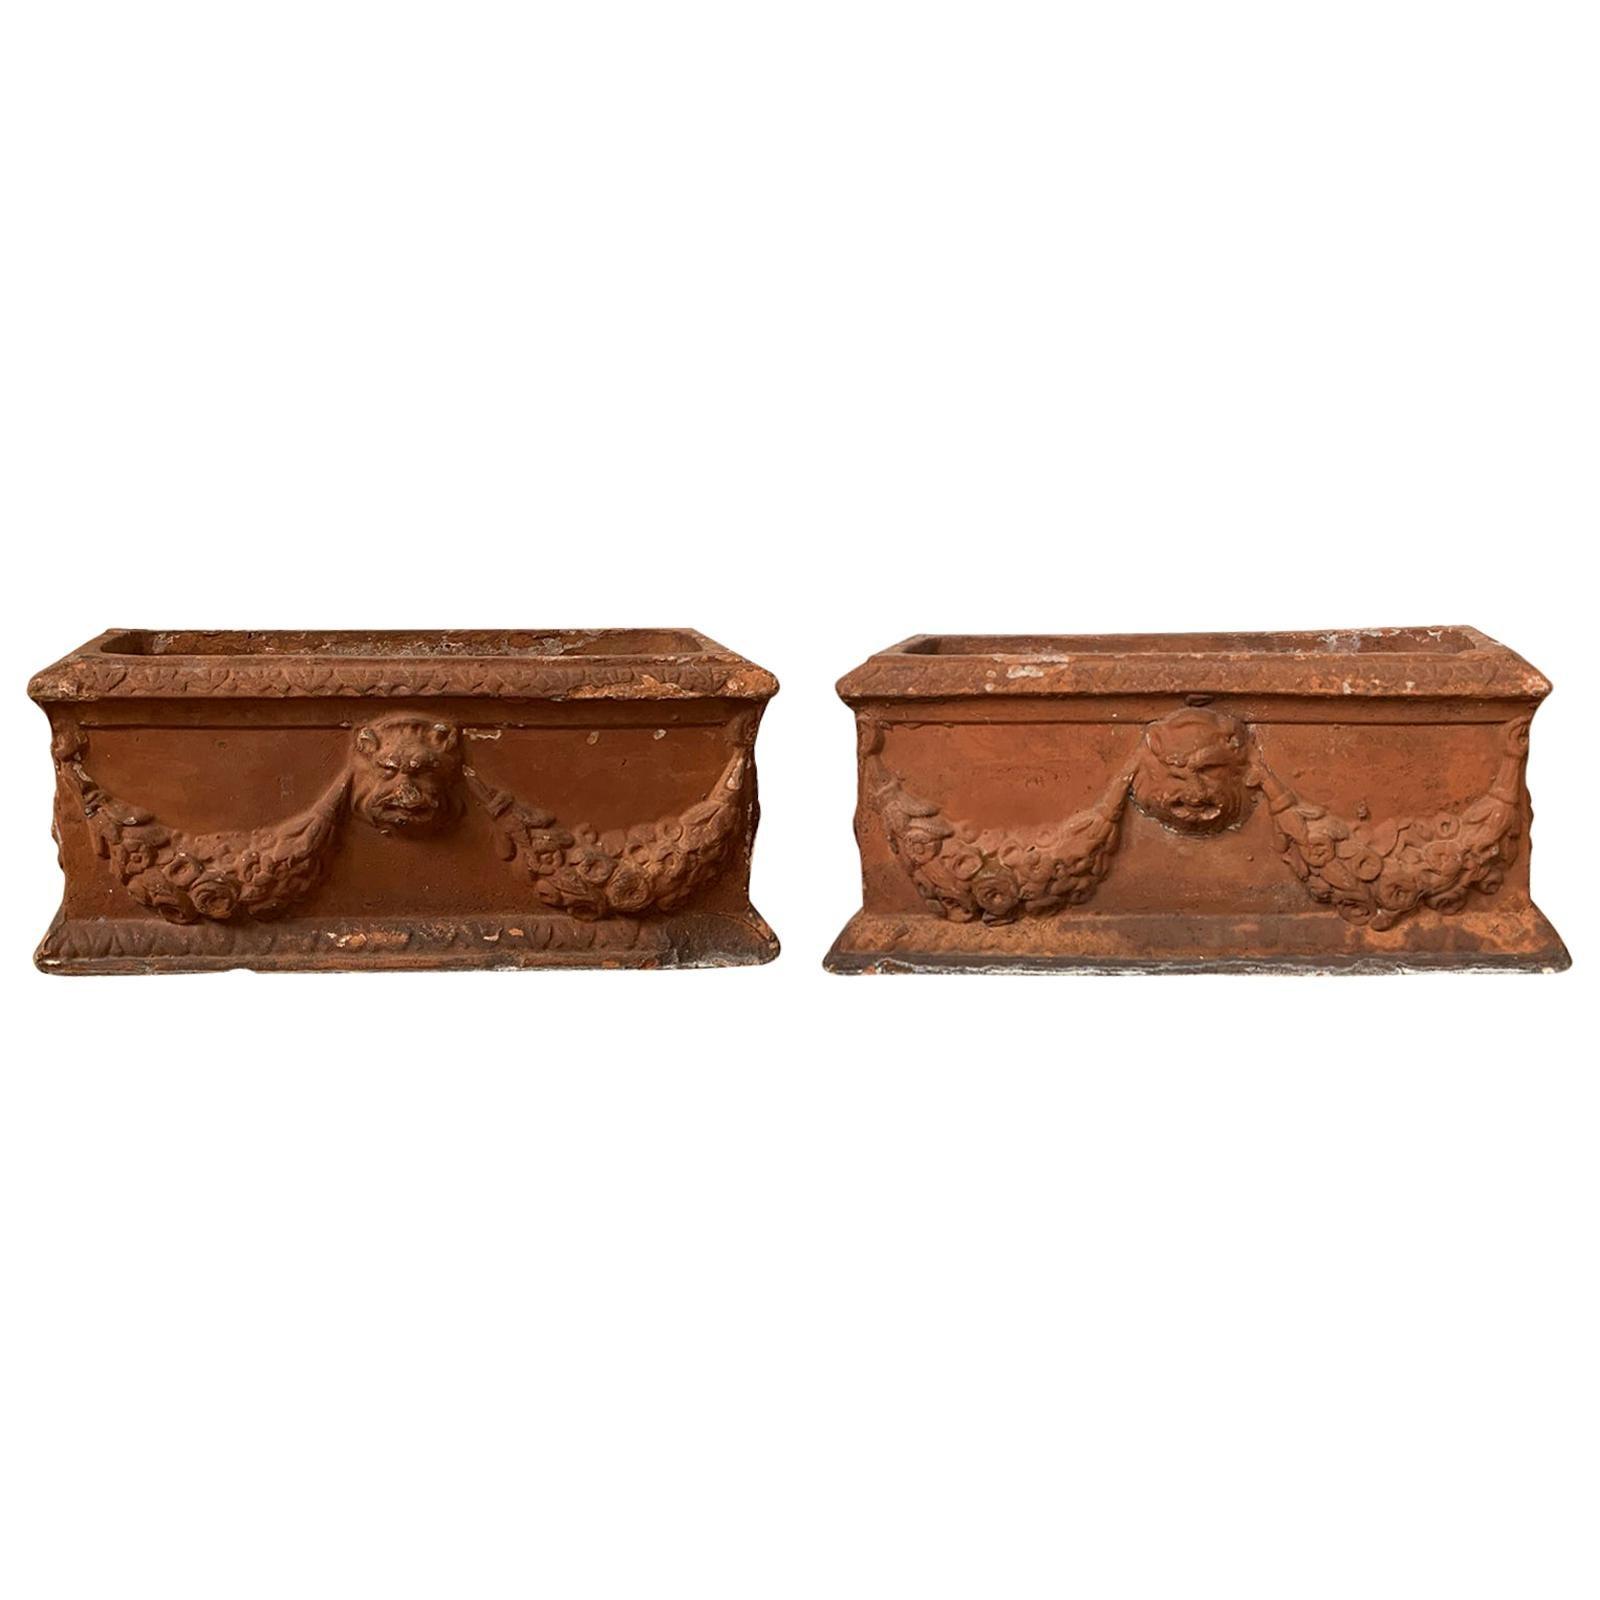 Pair of 19th-20th Century Italian Poss. Impruneta Handmade Terracotta Planters